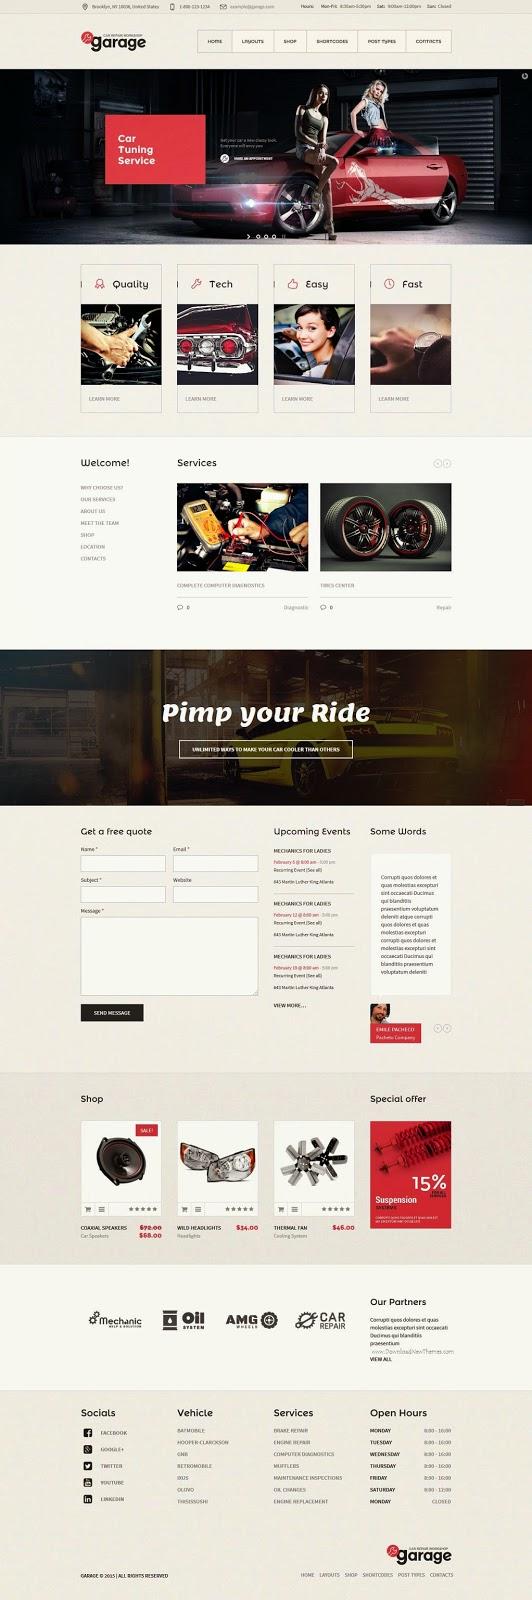 Design car repair workshop - Garage Auto Mechanic Car Repair Workshop Theme 2015 Wordpress Webdesign